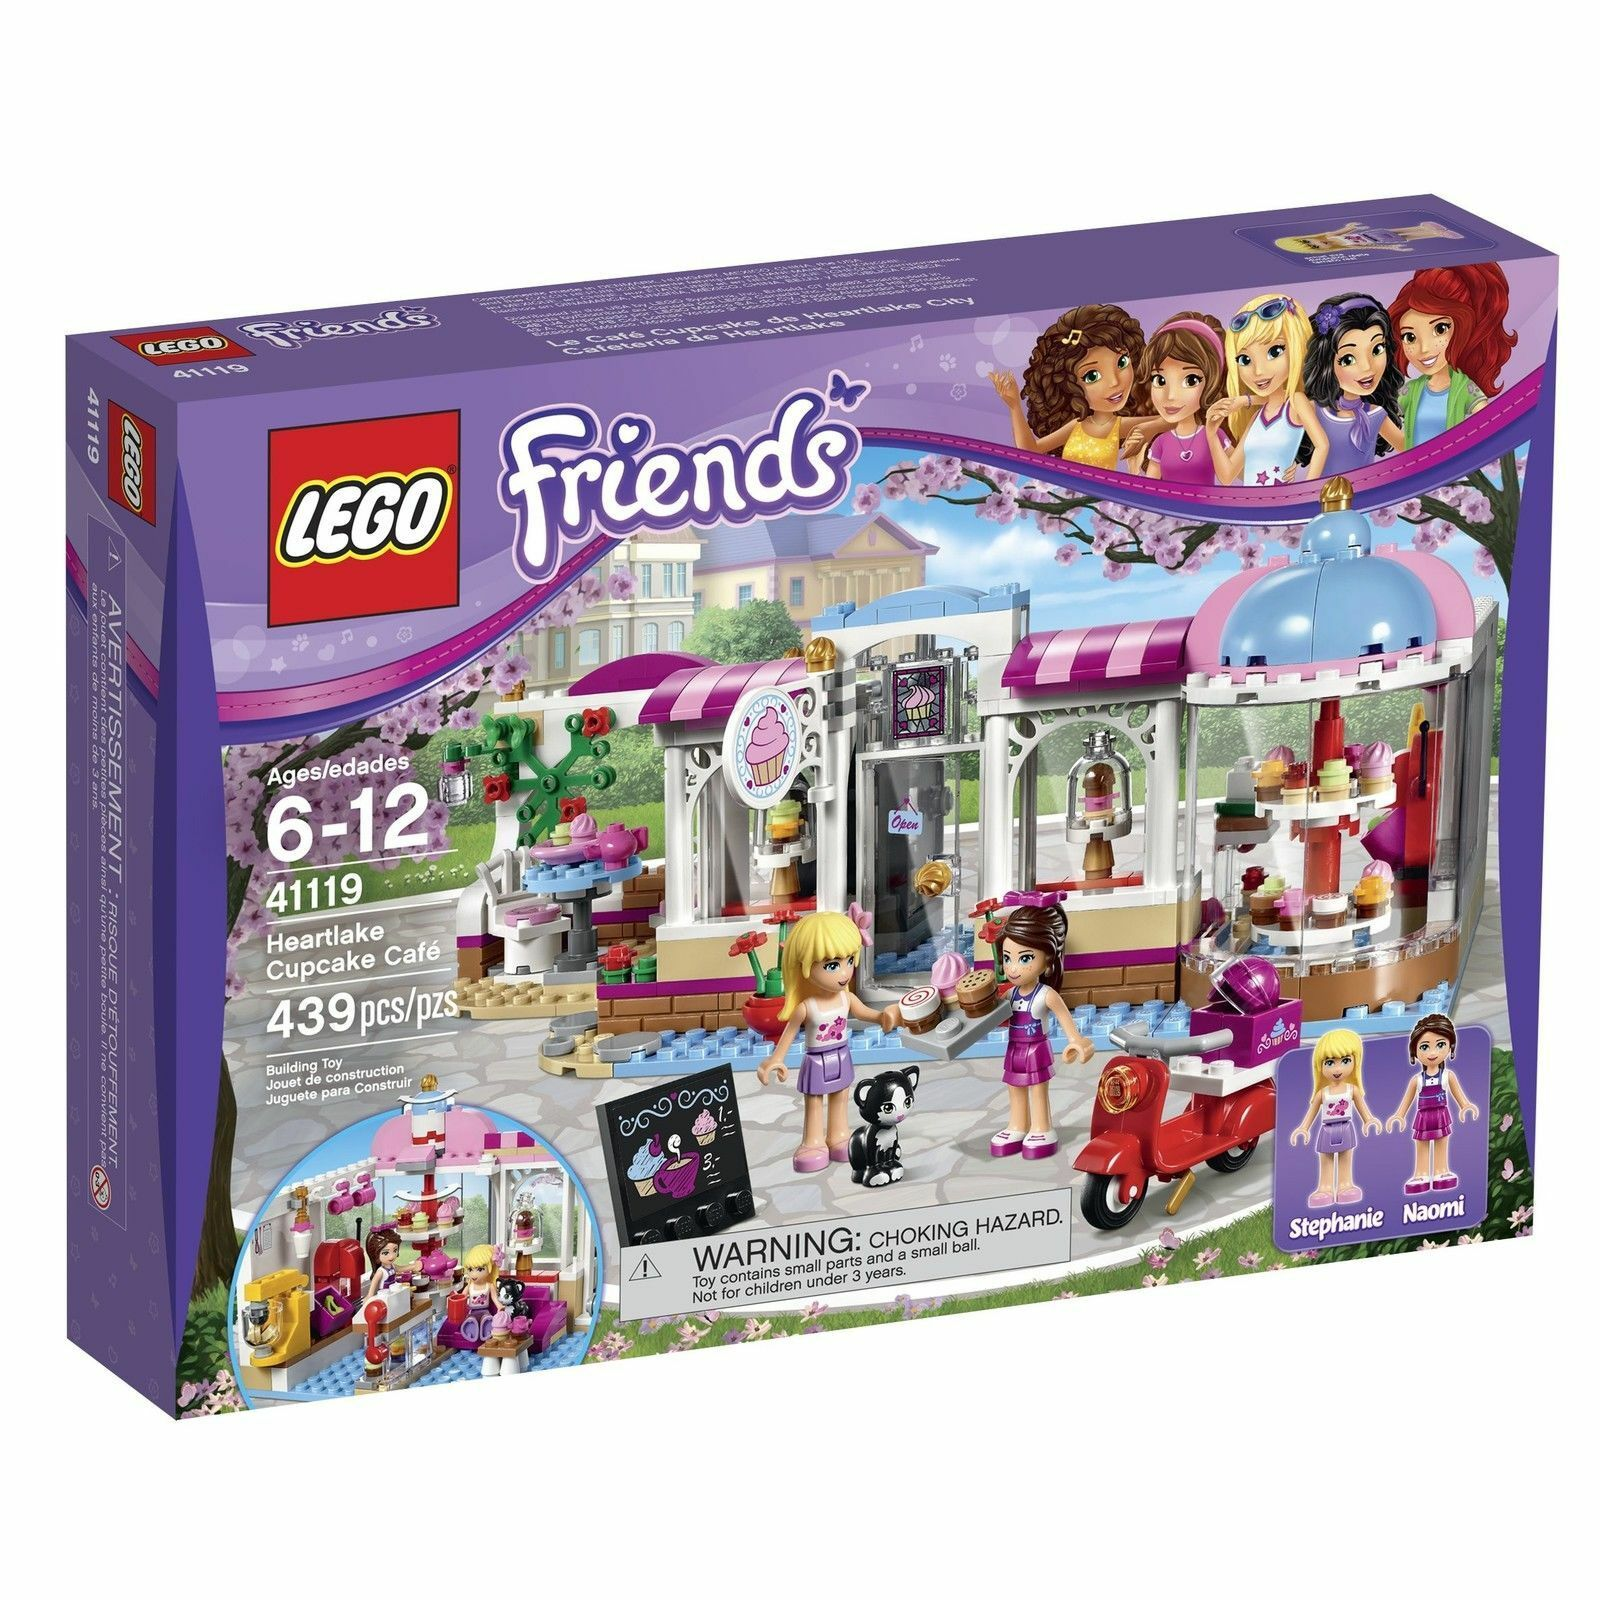 41119 HEARTLAKE CUPCAKE CAFE lego friends set NEW legos STEPHANIE NAOMI kitty